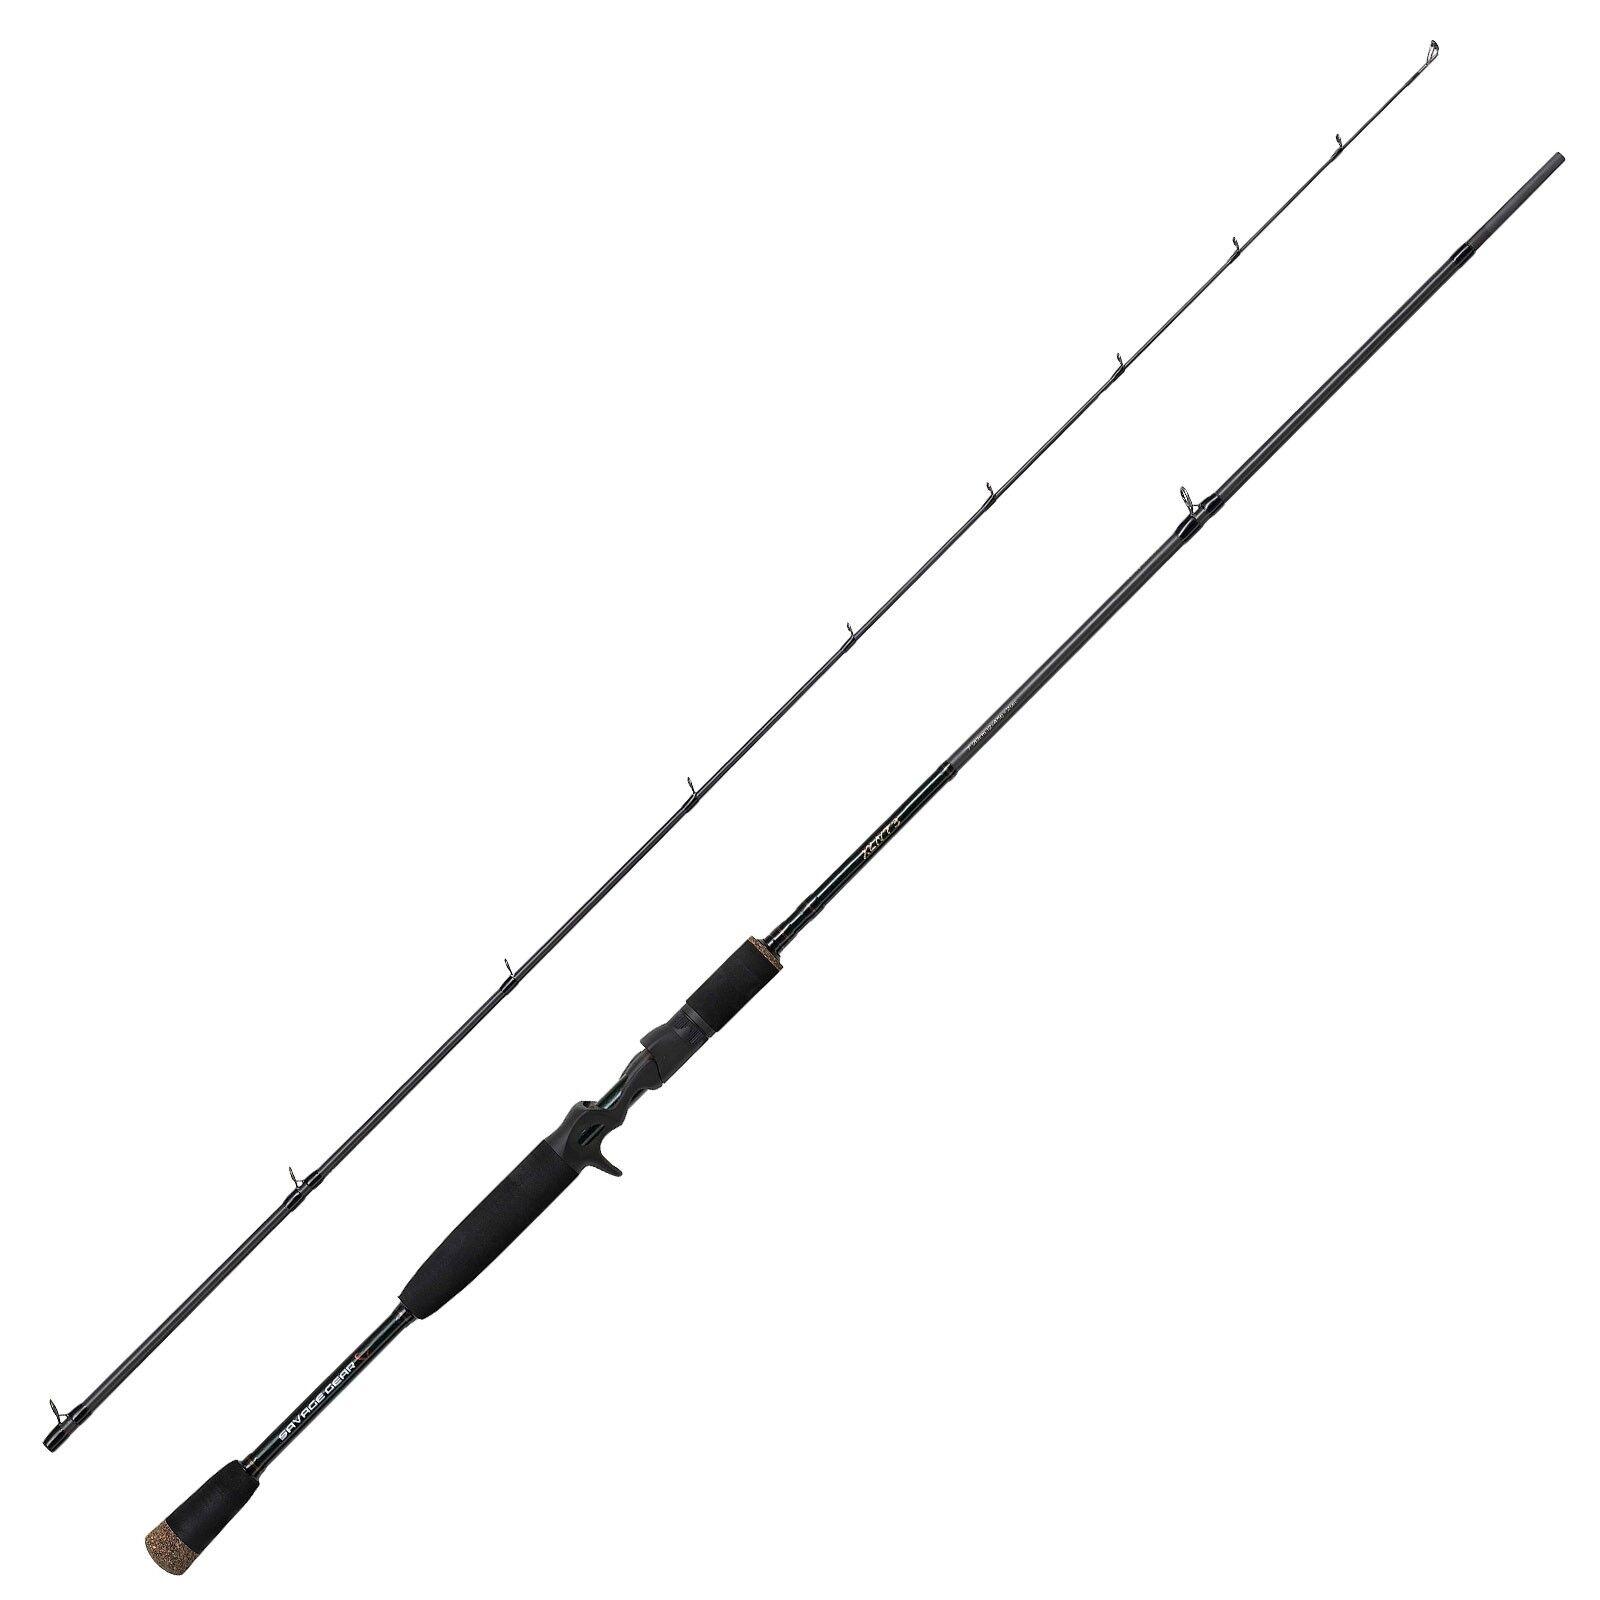 Savage Gear baitcastrute – xlnt 3 disparador 7ft 2,13m 12-45g 2 pzas.